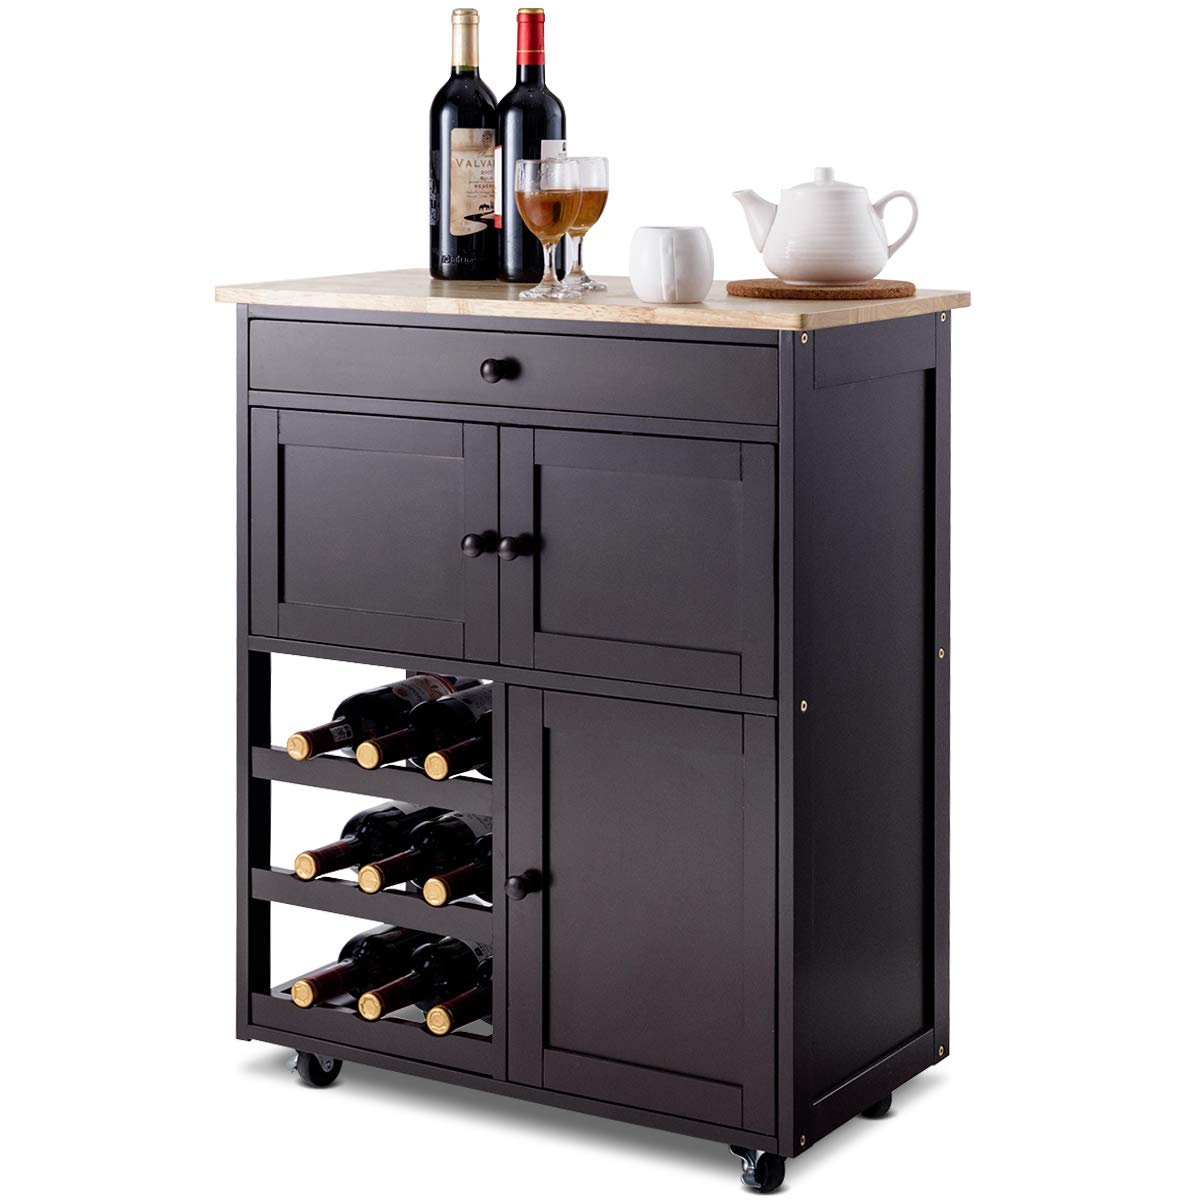 Giantex Modern Rolling Kitchen Trolley Cart w/Drawer & Wine Rack Storage Cabinet Home Restaurant Island Serving Cart w/Wheels (Brown) by Giantex